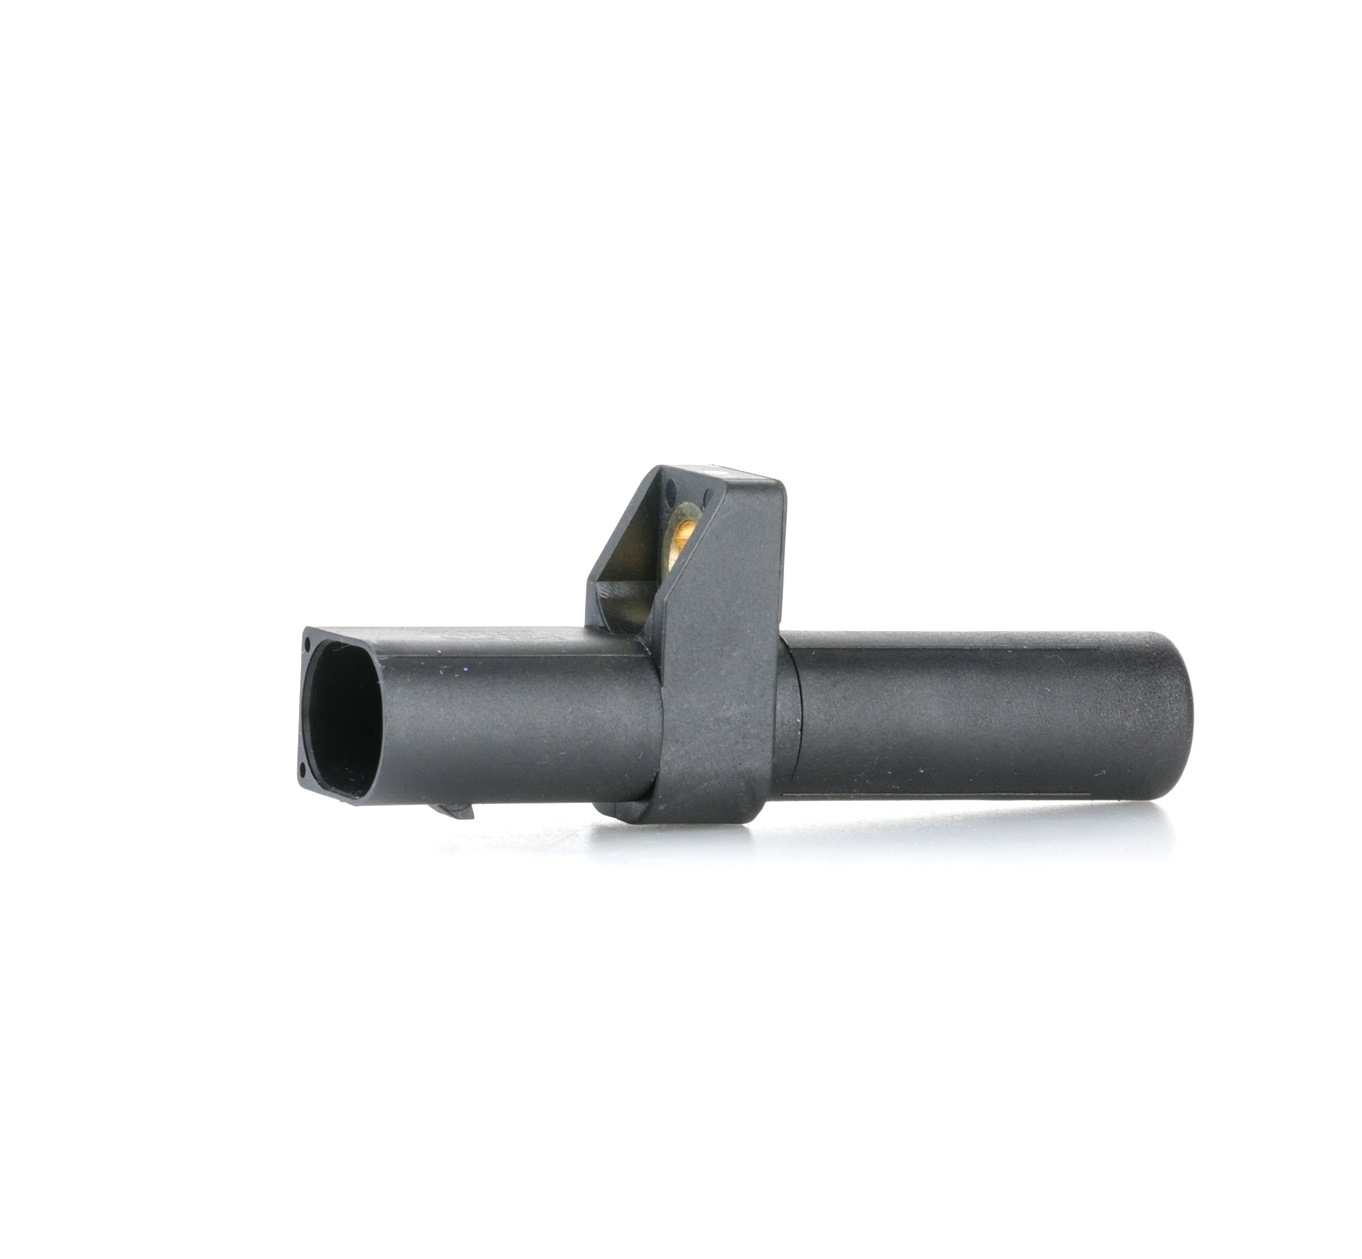 MERCEDES-BENZ GLC 2020 Zündsystem - Original DELPHI SS10925 Anschlussanzahl: 2